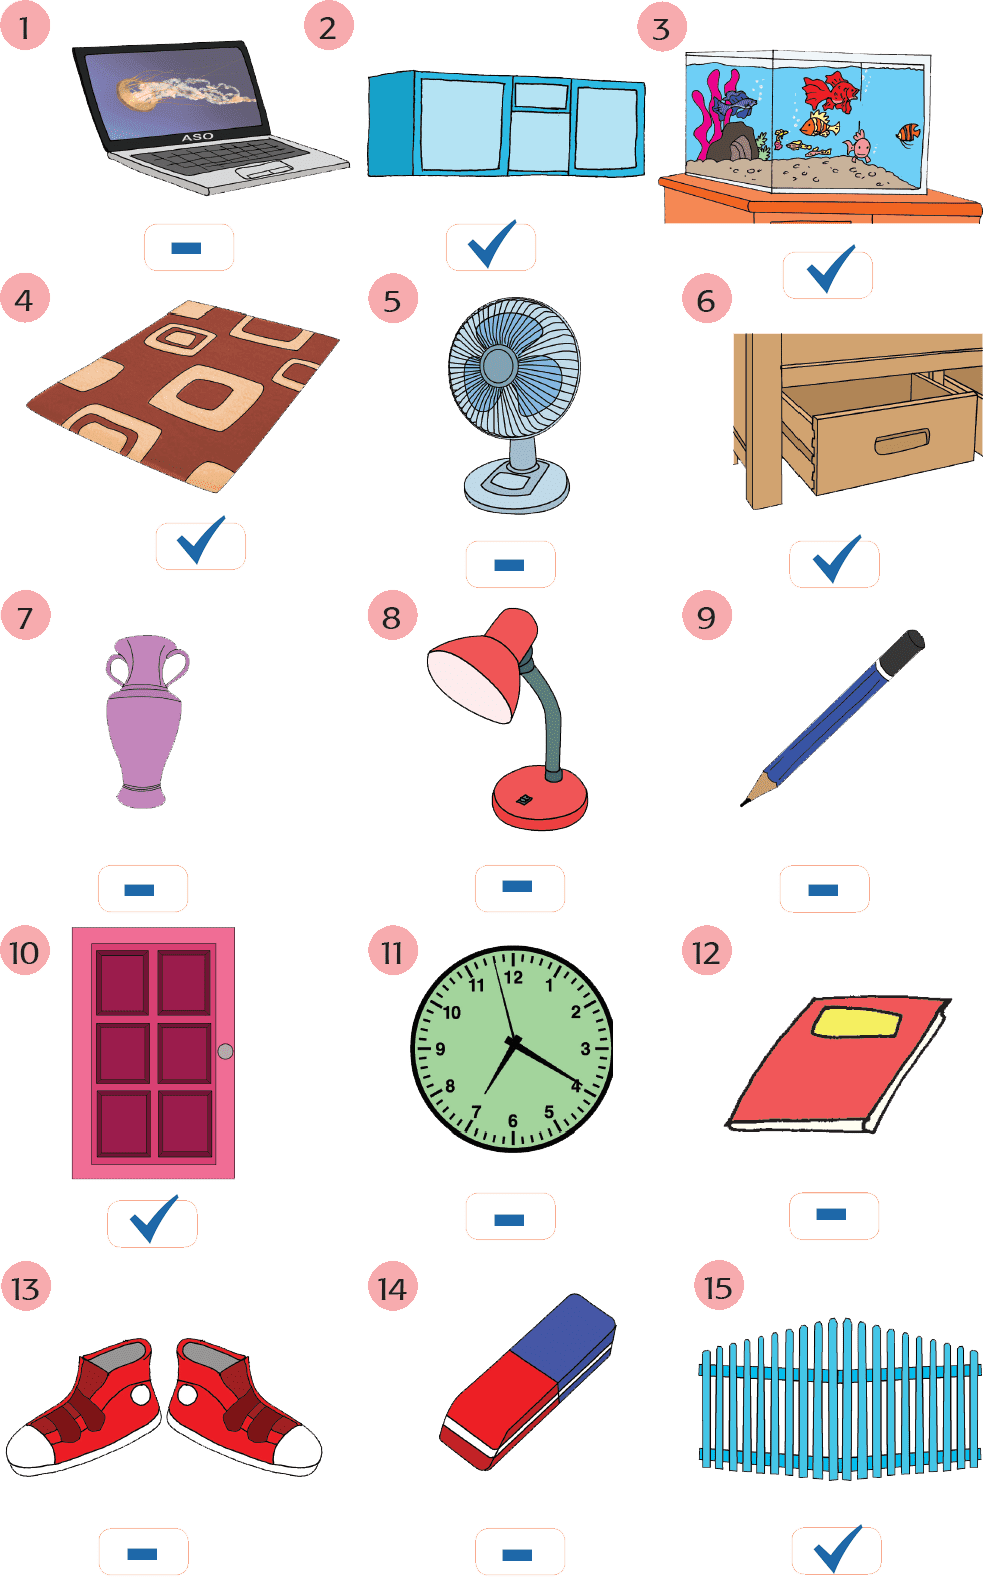 Kunci Jawaban Halaman 22, 23, 25, 27, 28, 29, 30, 32 Tema 5 Kelas 2